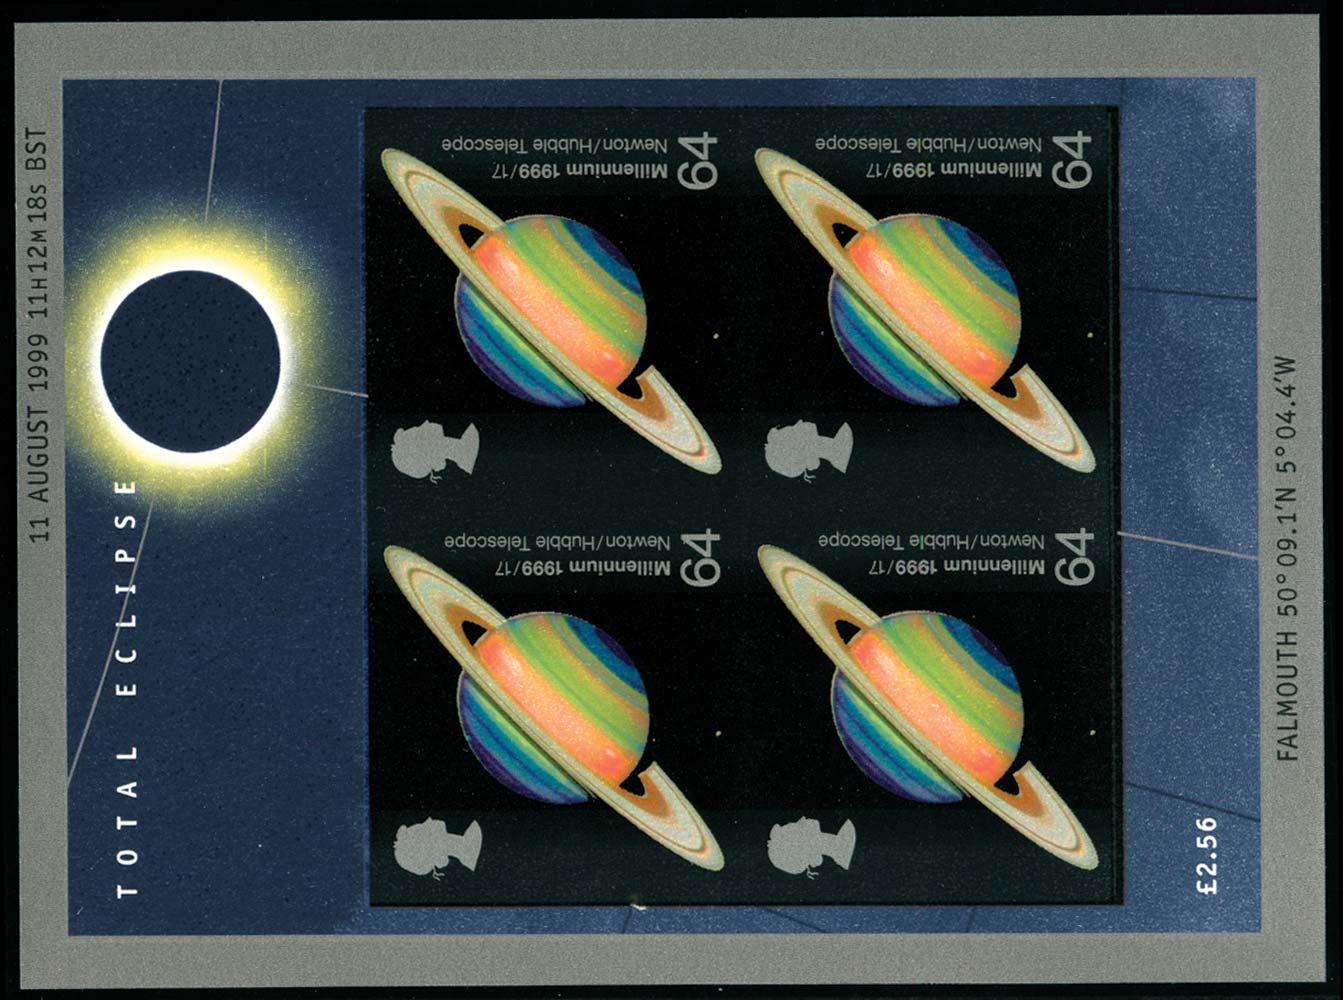 GB 1999  SGMS2106a Mint imperf sheet